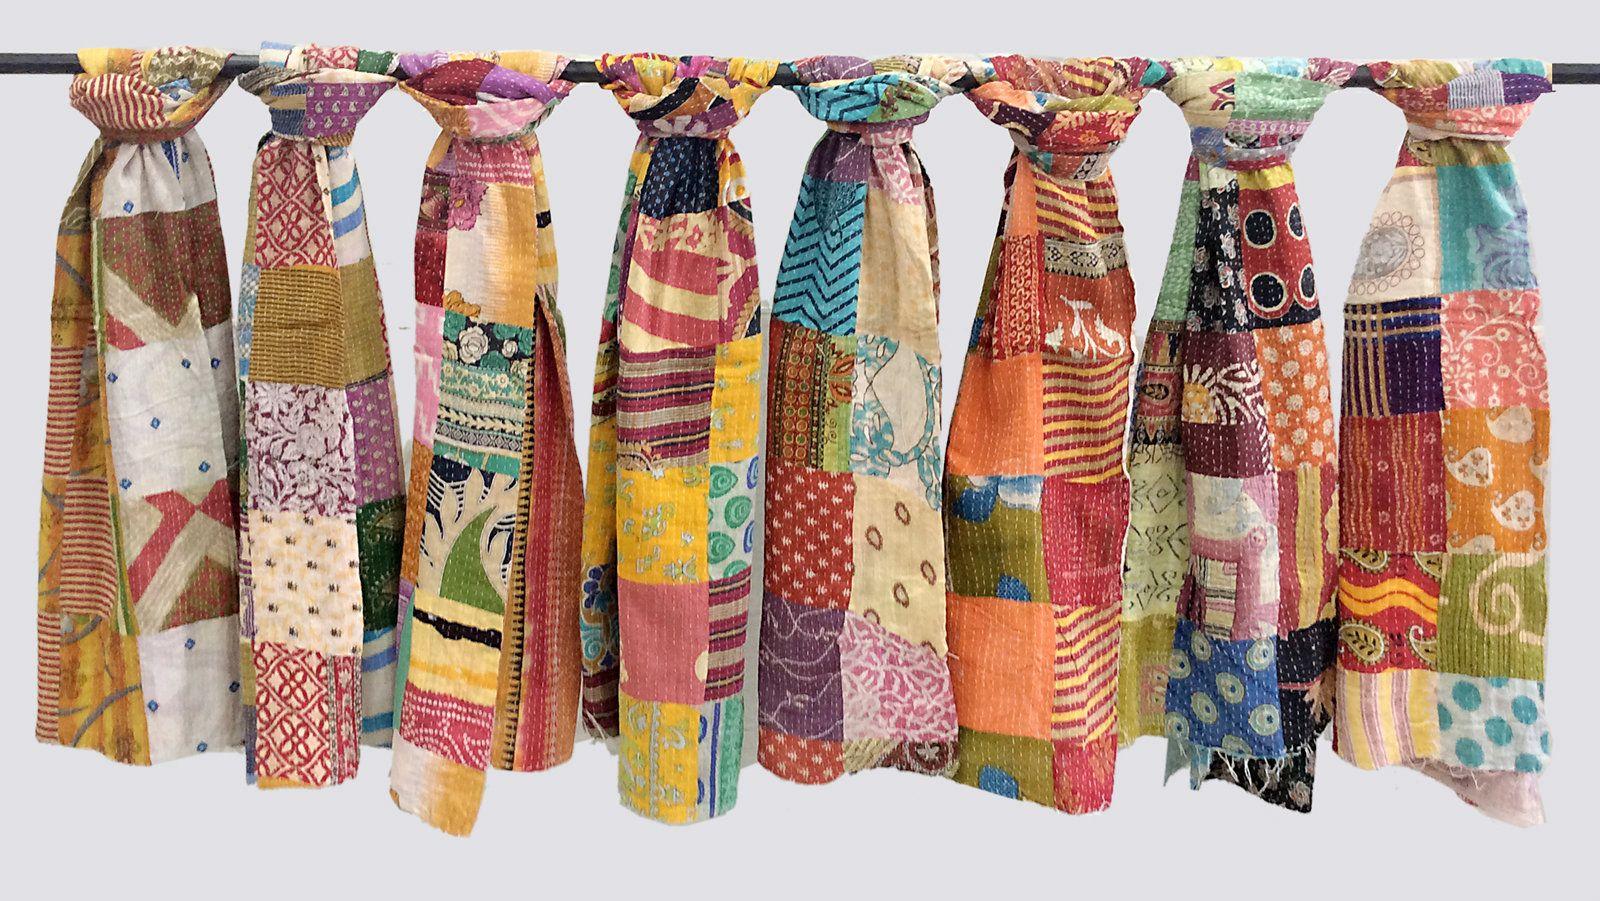 5 Pc Lot Vintage Kantha Handmade Scarf Fashion Bandana Assorted Cotton Stole